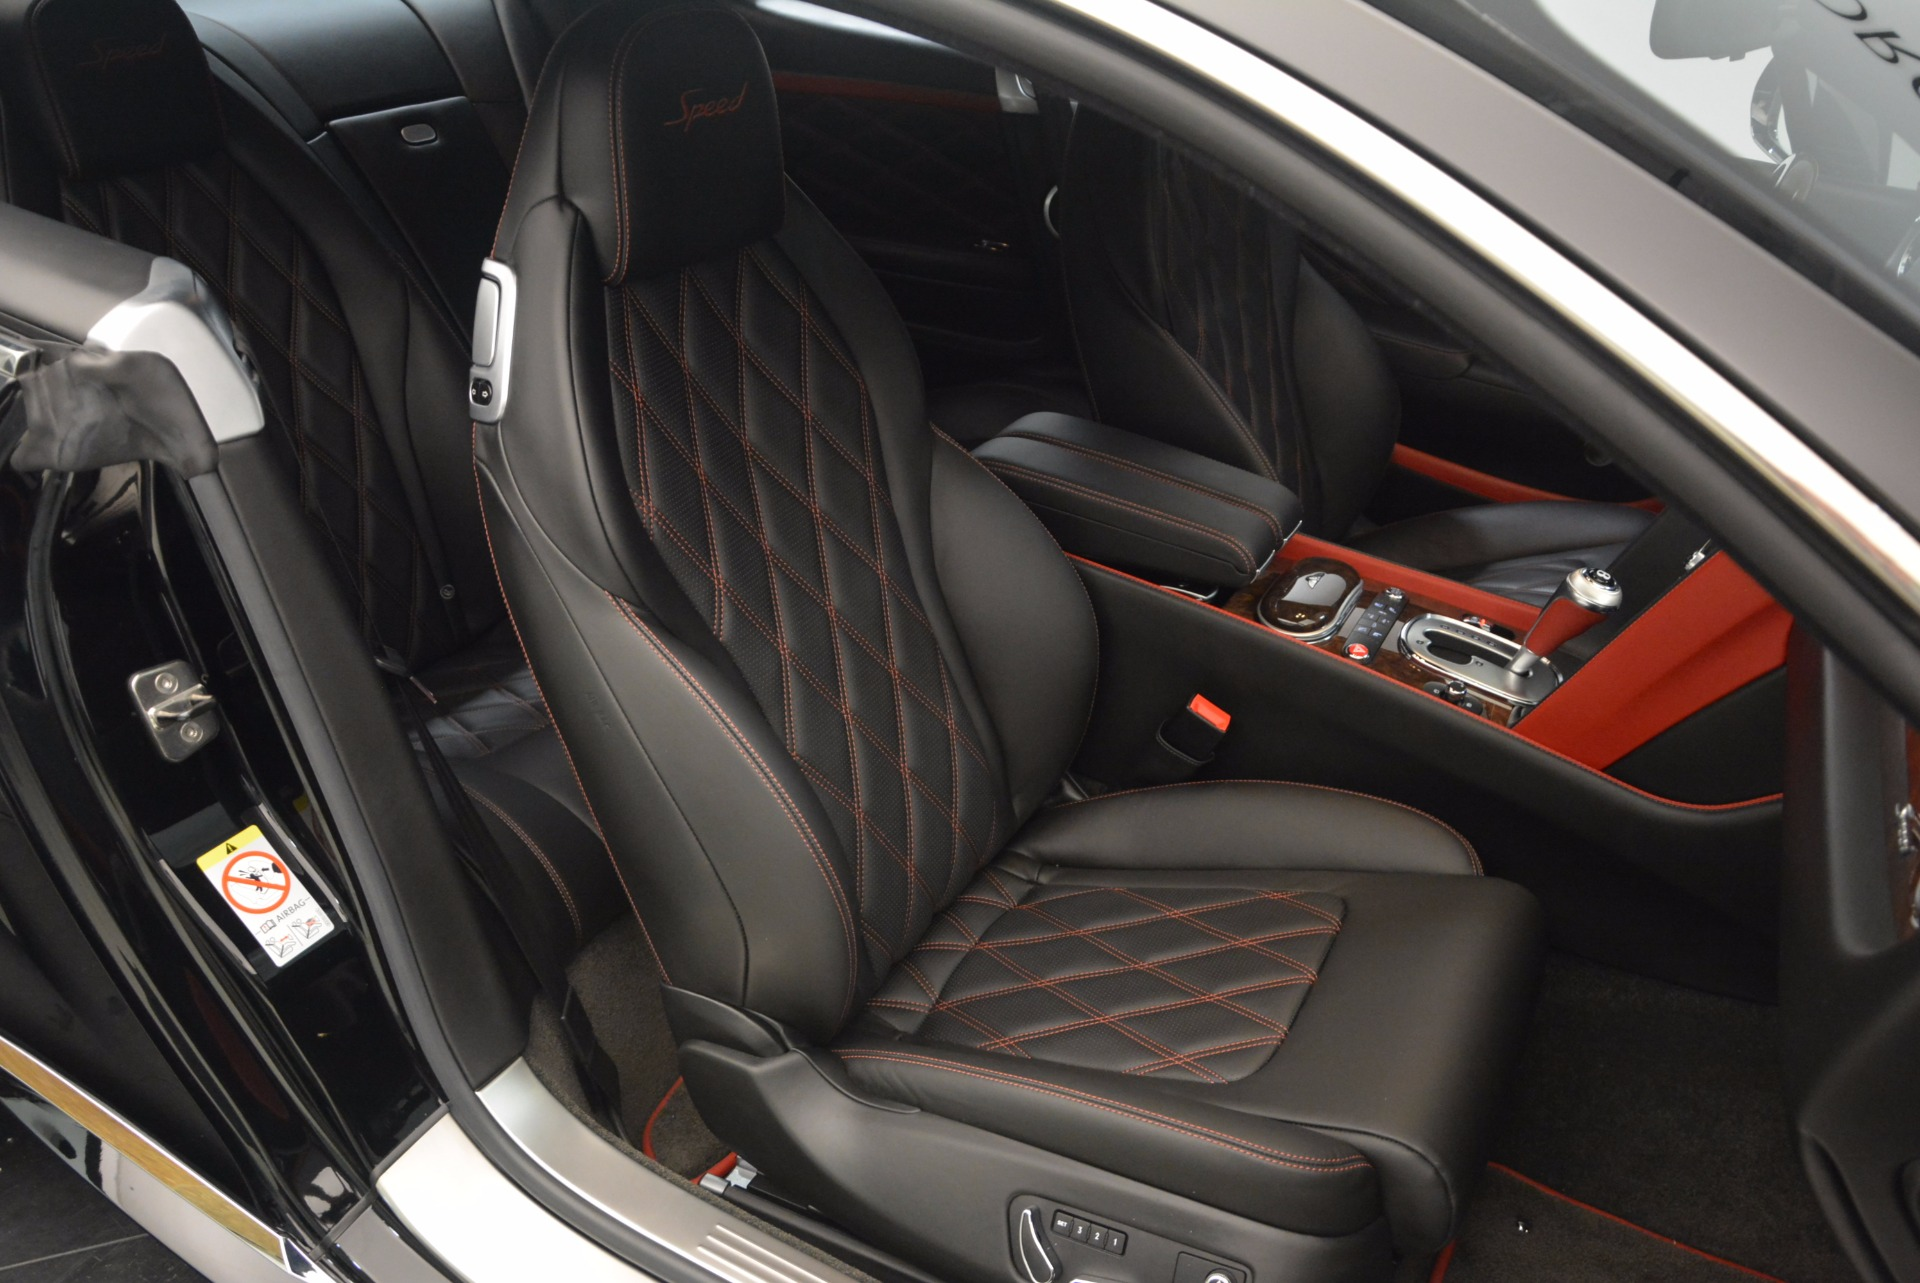 Used 2015 Bentley Continental GT Speed For Sale In Westport, CT 1646_p33